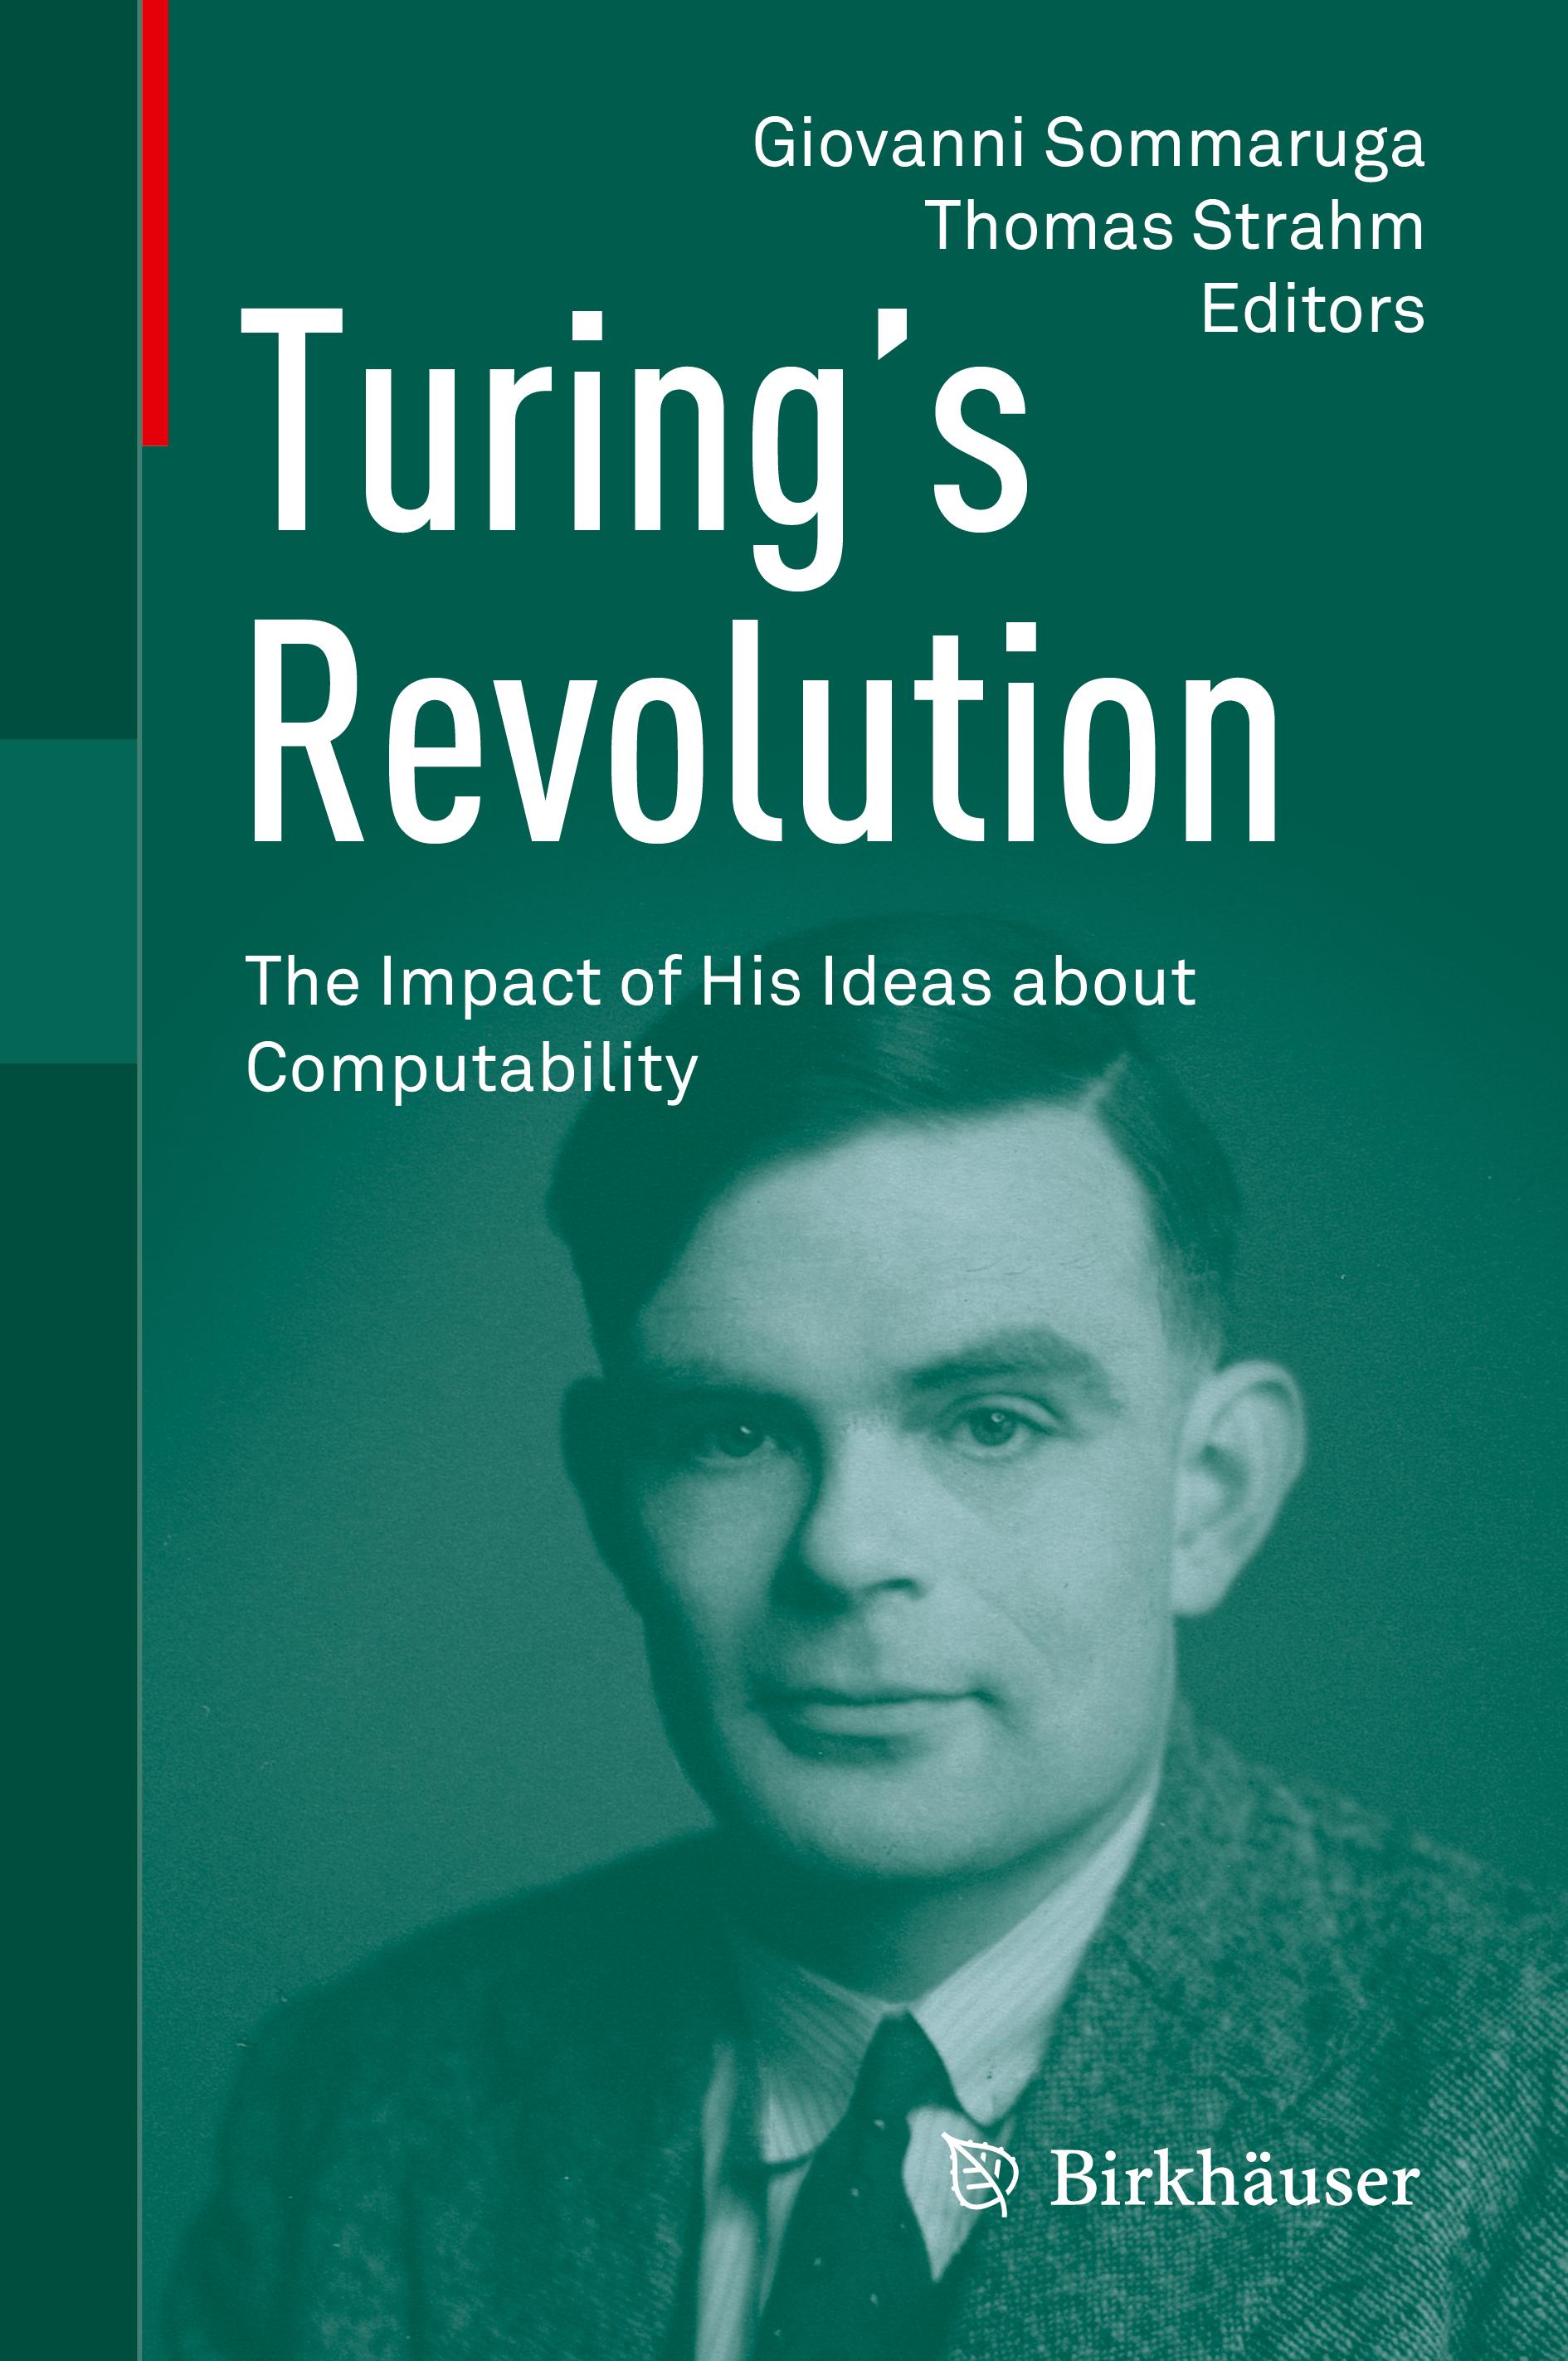 Sommaruga, Giovanni - Turing's Revolution, ebook